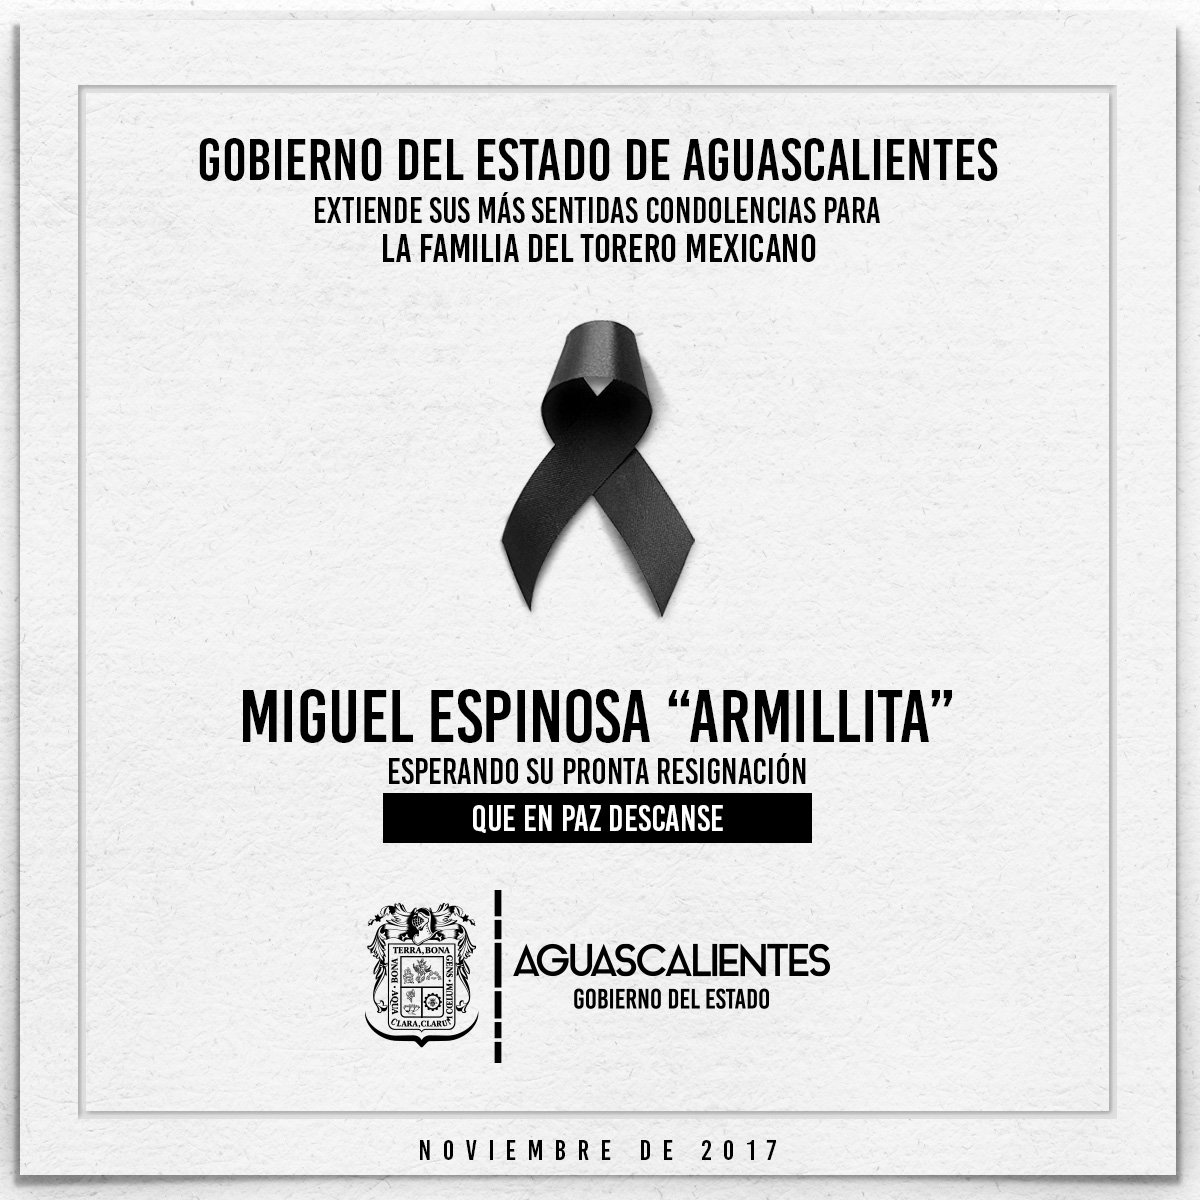 RT @MartinOrozcoAgs: Descanse en paz Miguel Espinosa 'Armillita', aguascalentense y figura del toreo en México. https://t.co/ZpxHvrI98H